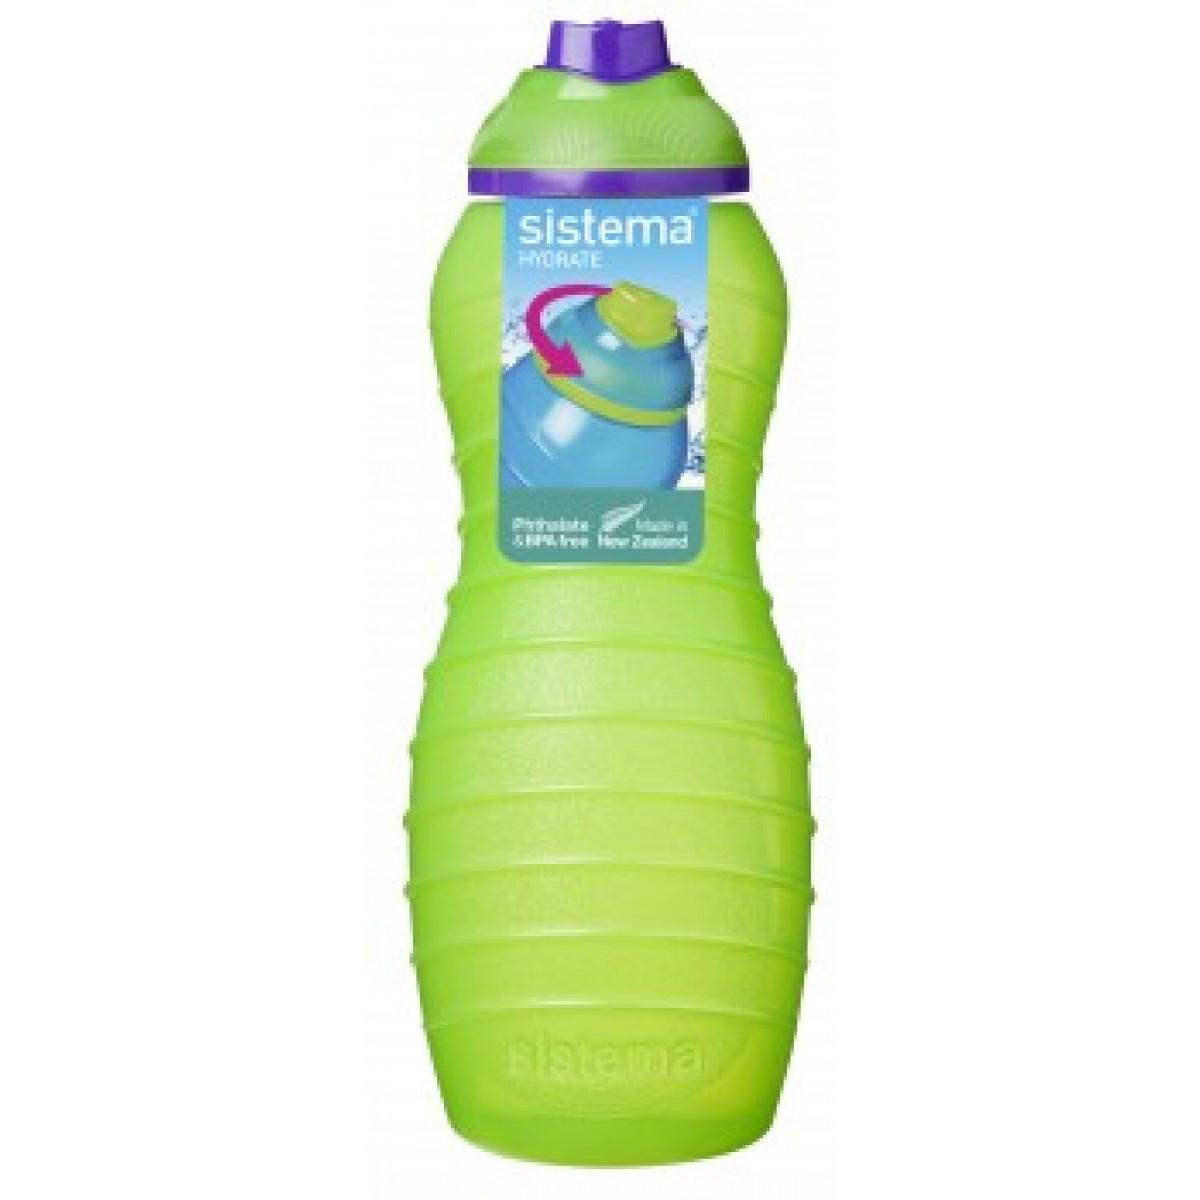 SISTEMA Davina drikkeflaske grøn 700 ml.